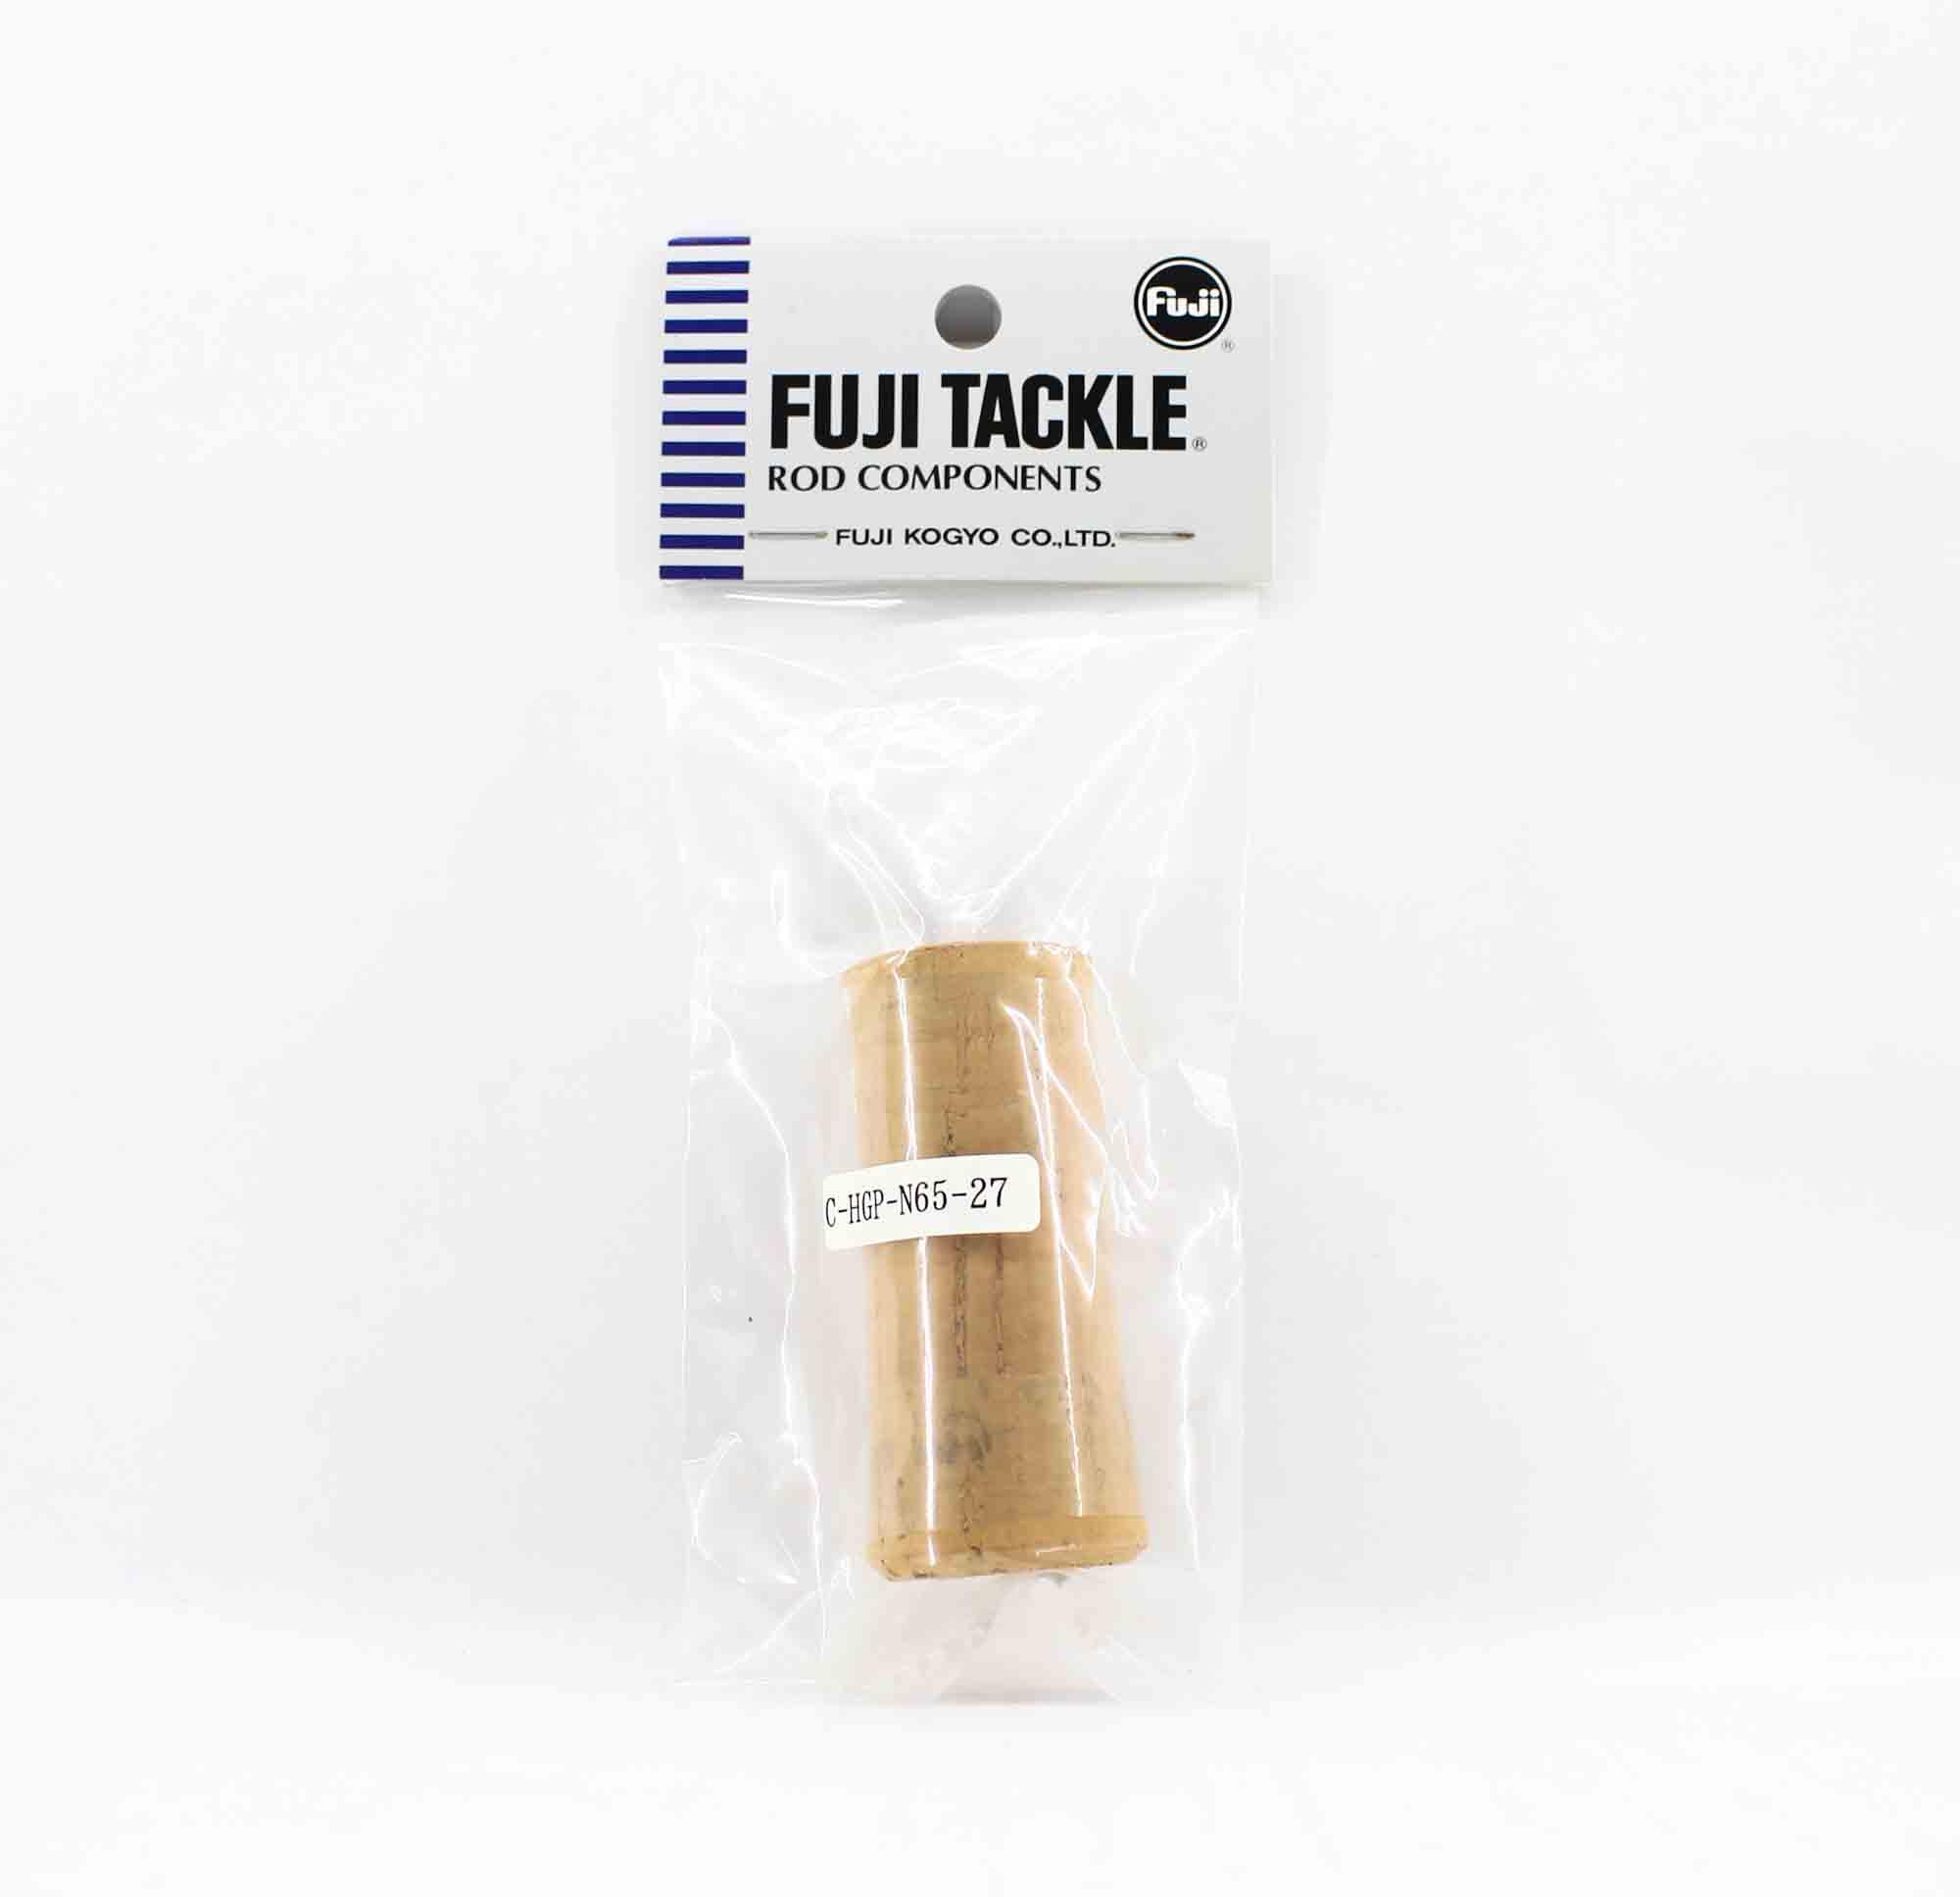 Fuji C-HGPN Size 65-27 Cork Rod Handle (6324)